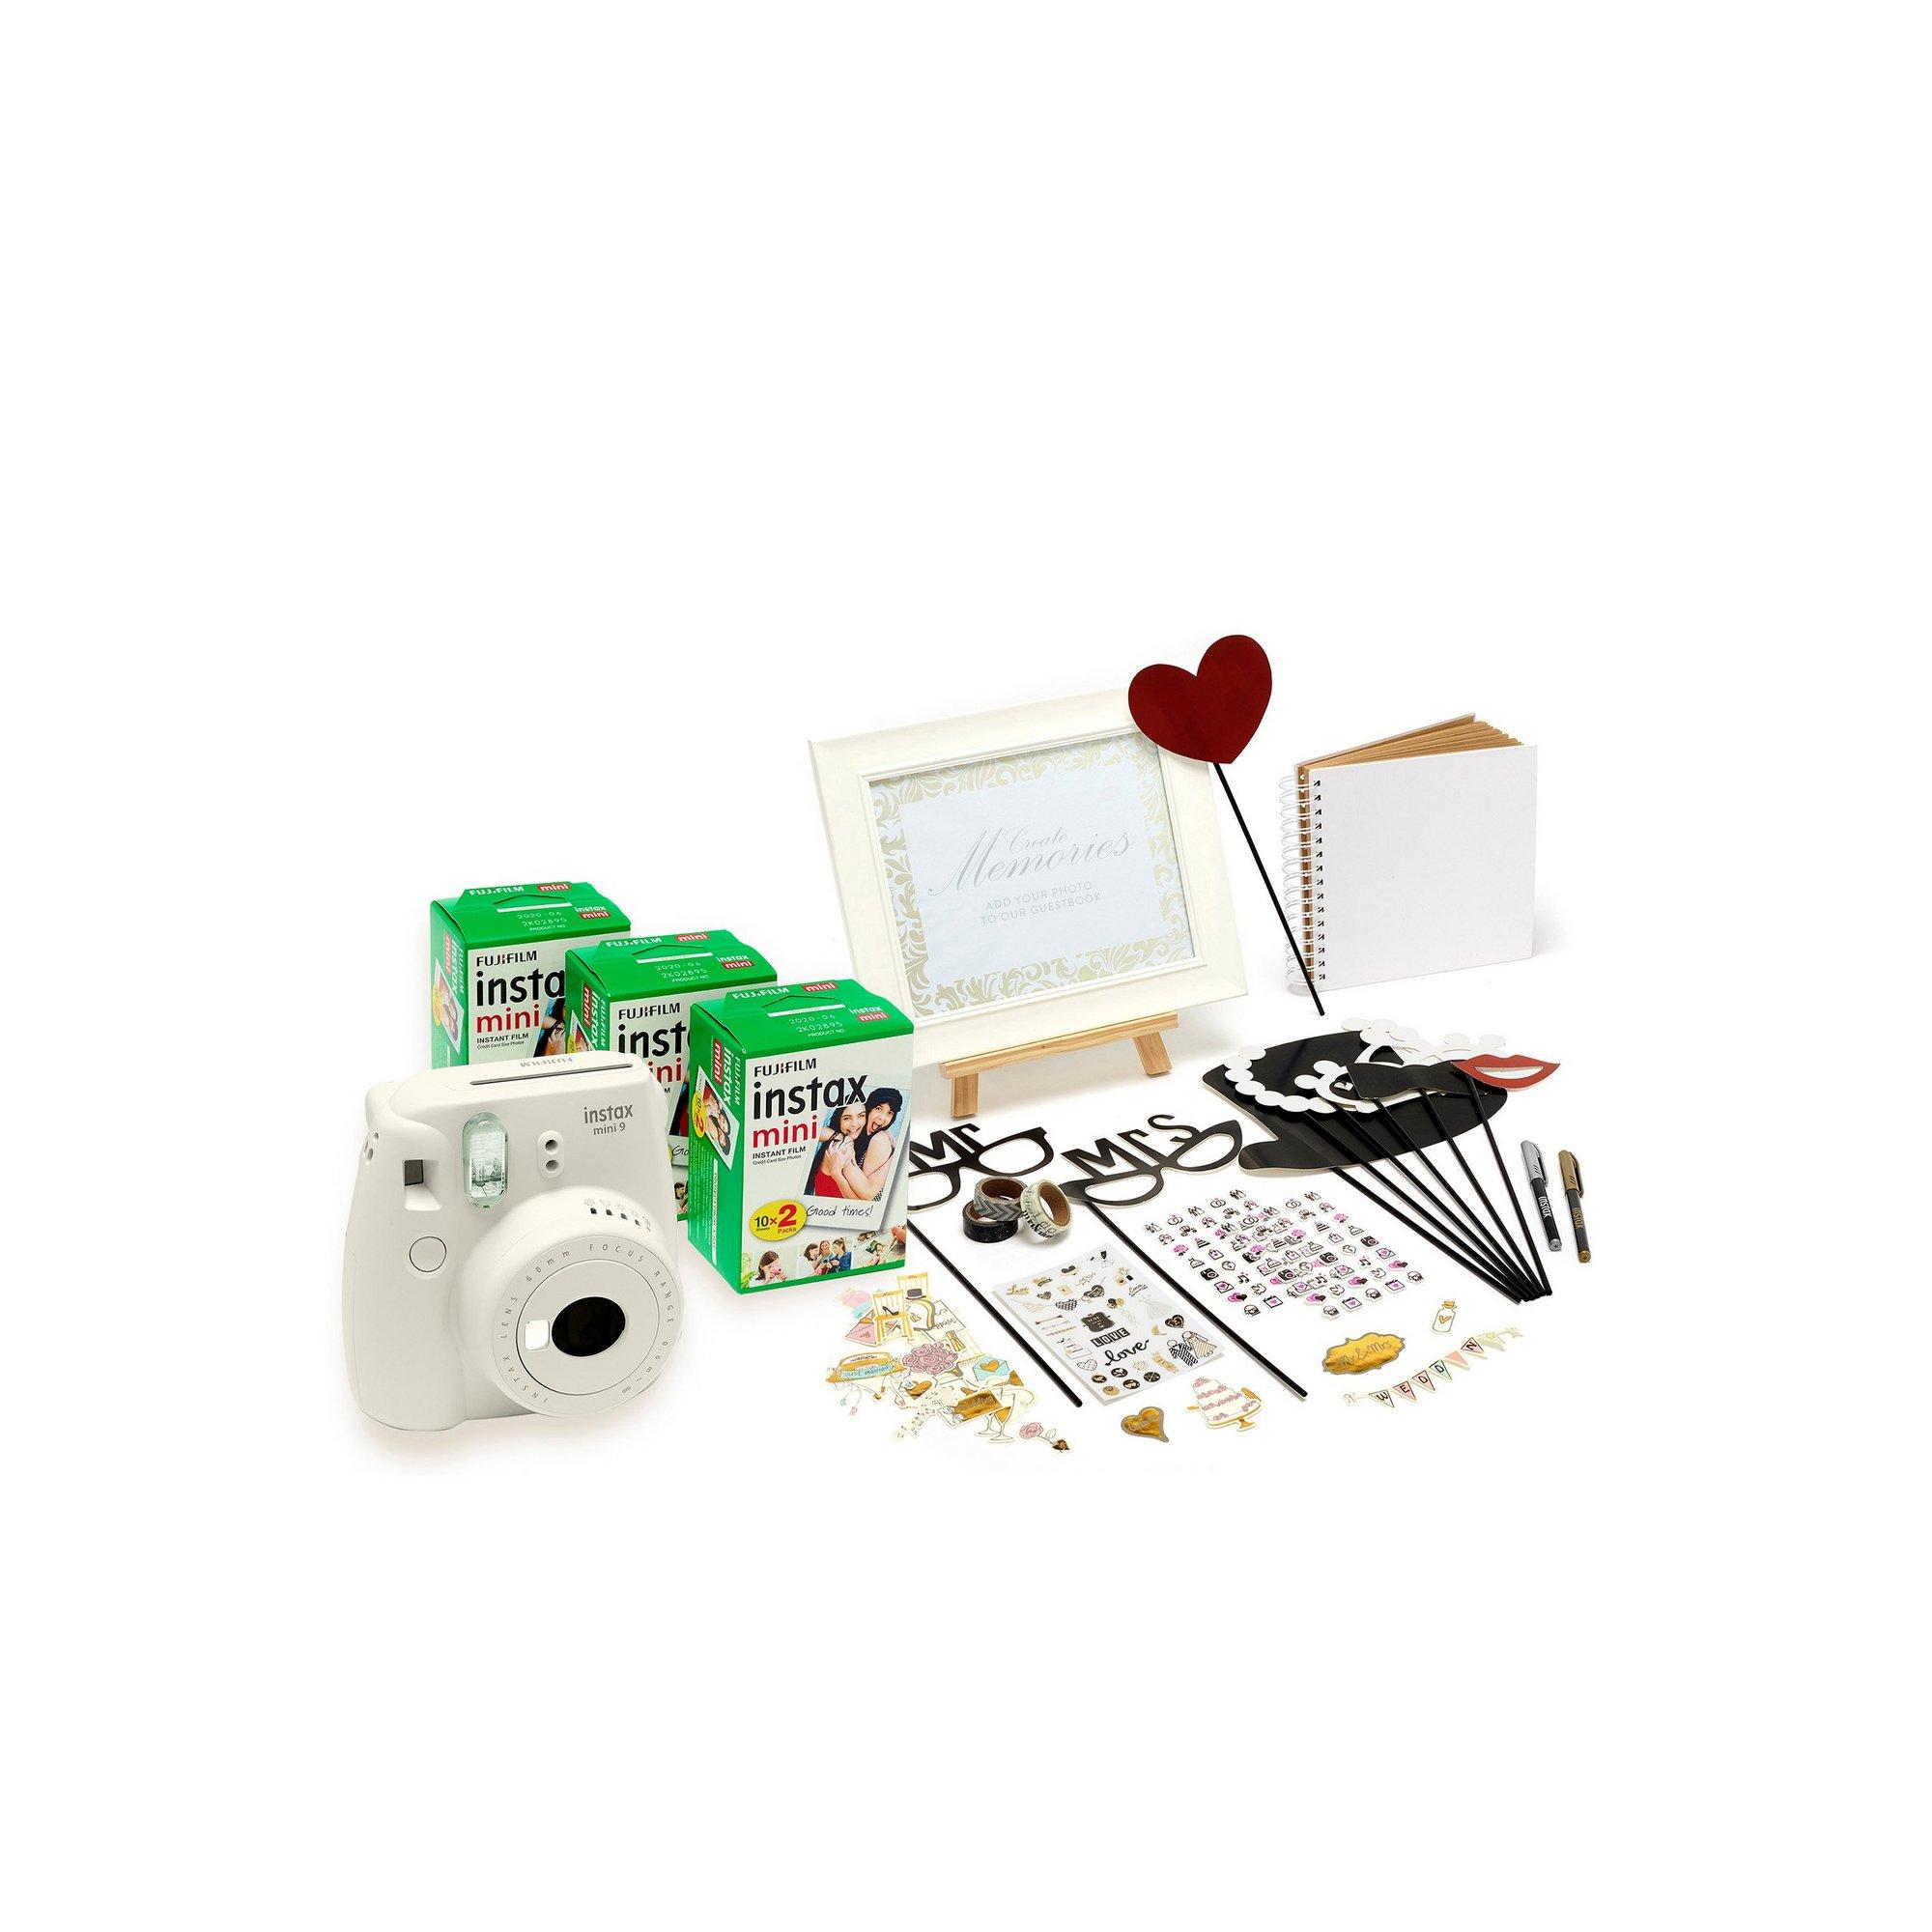 Image of Fujifilm Instax Mini 9 Wedding Camera Bundle